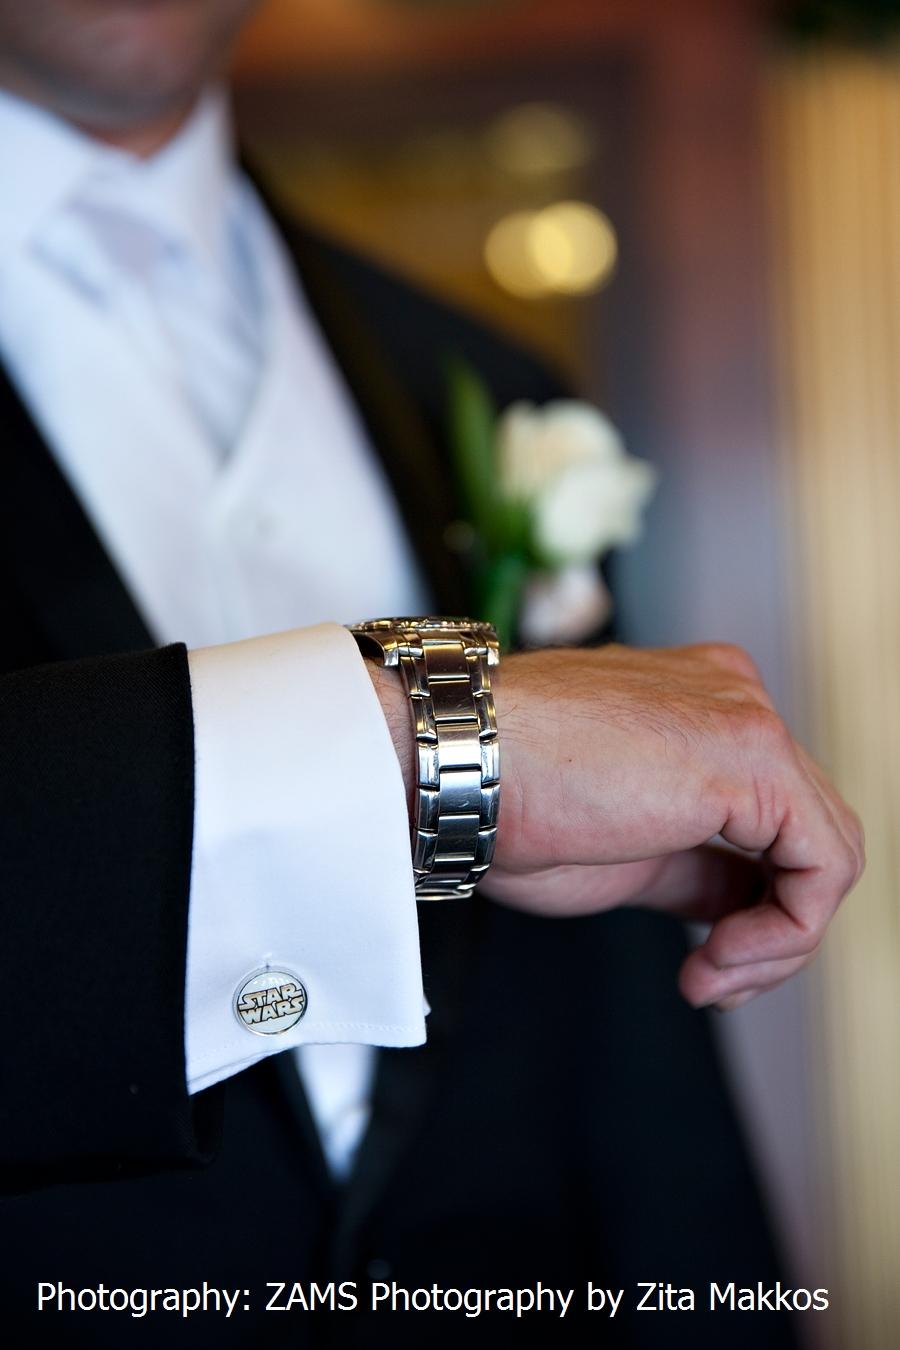 a_clockwork_orange_cuff_links_men_wedding_groomsmen_cufflinks_2.jpg